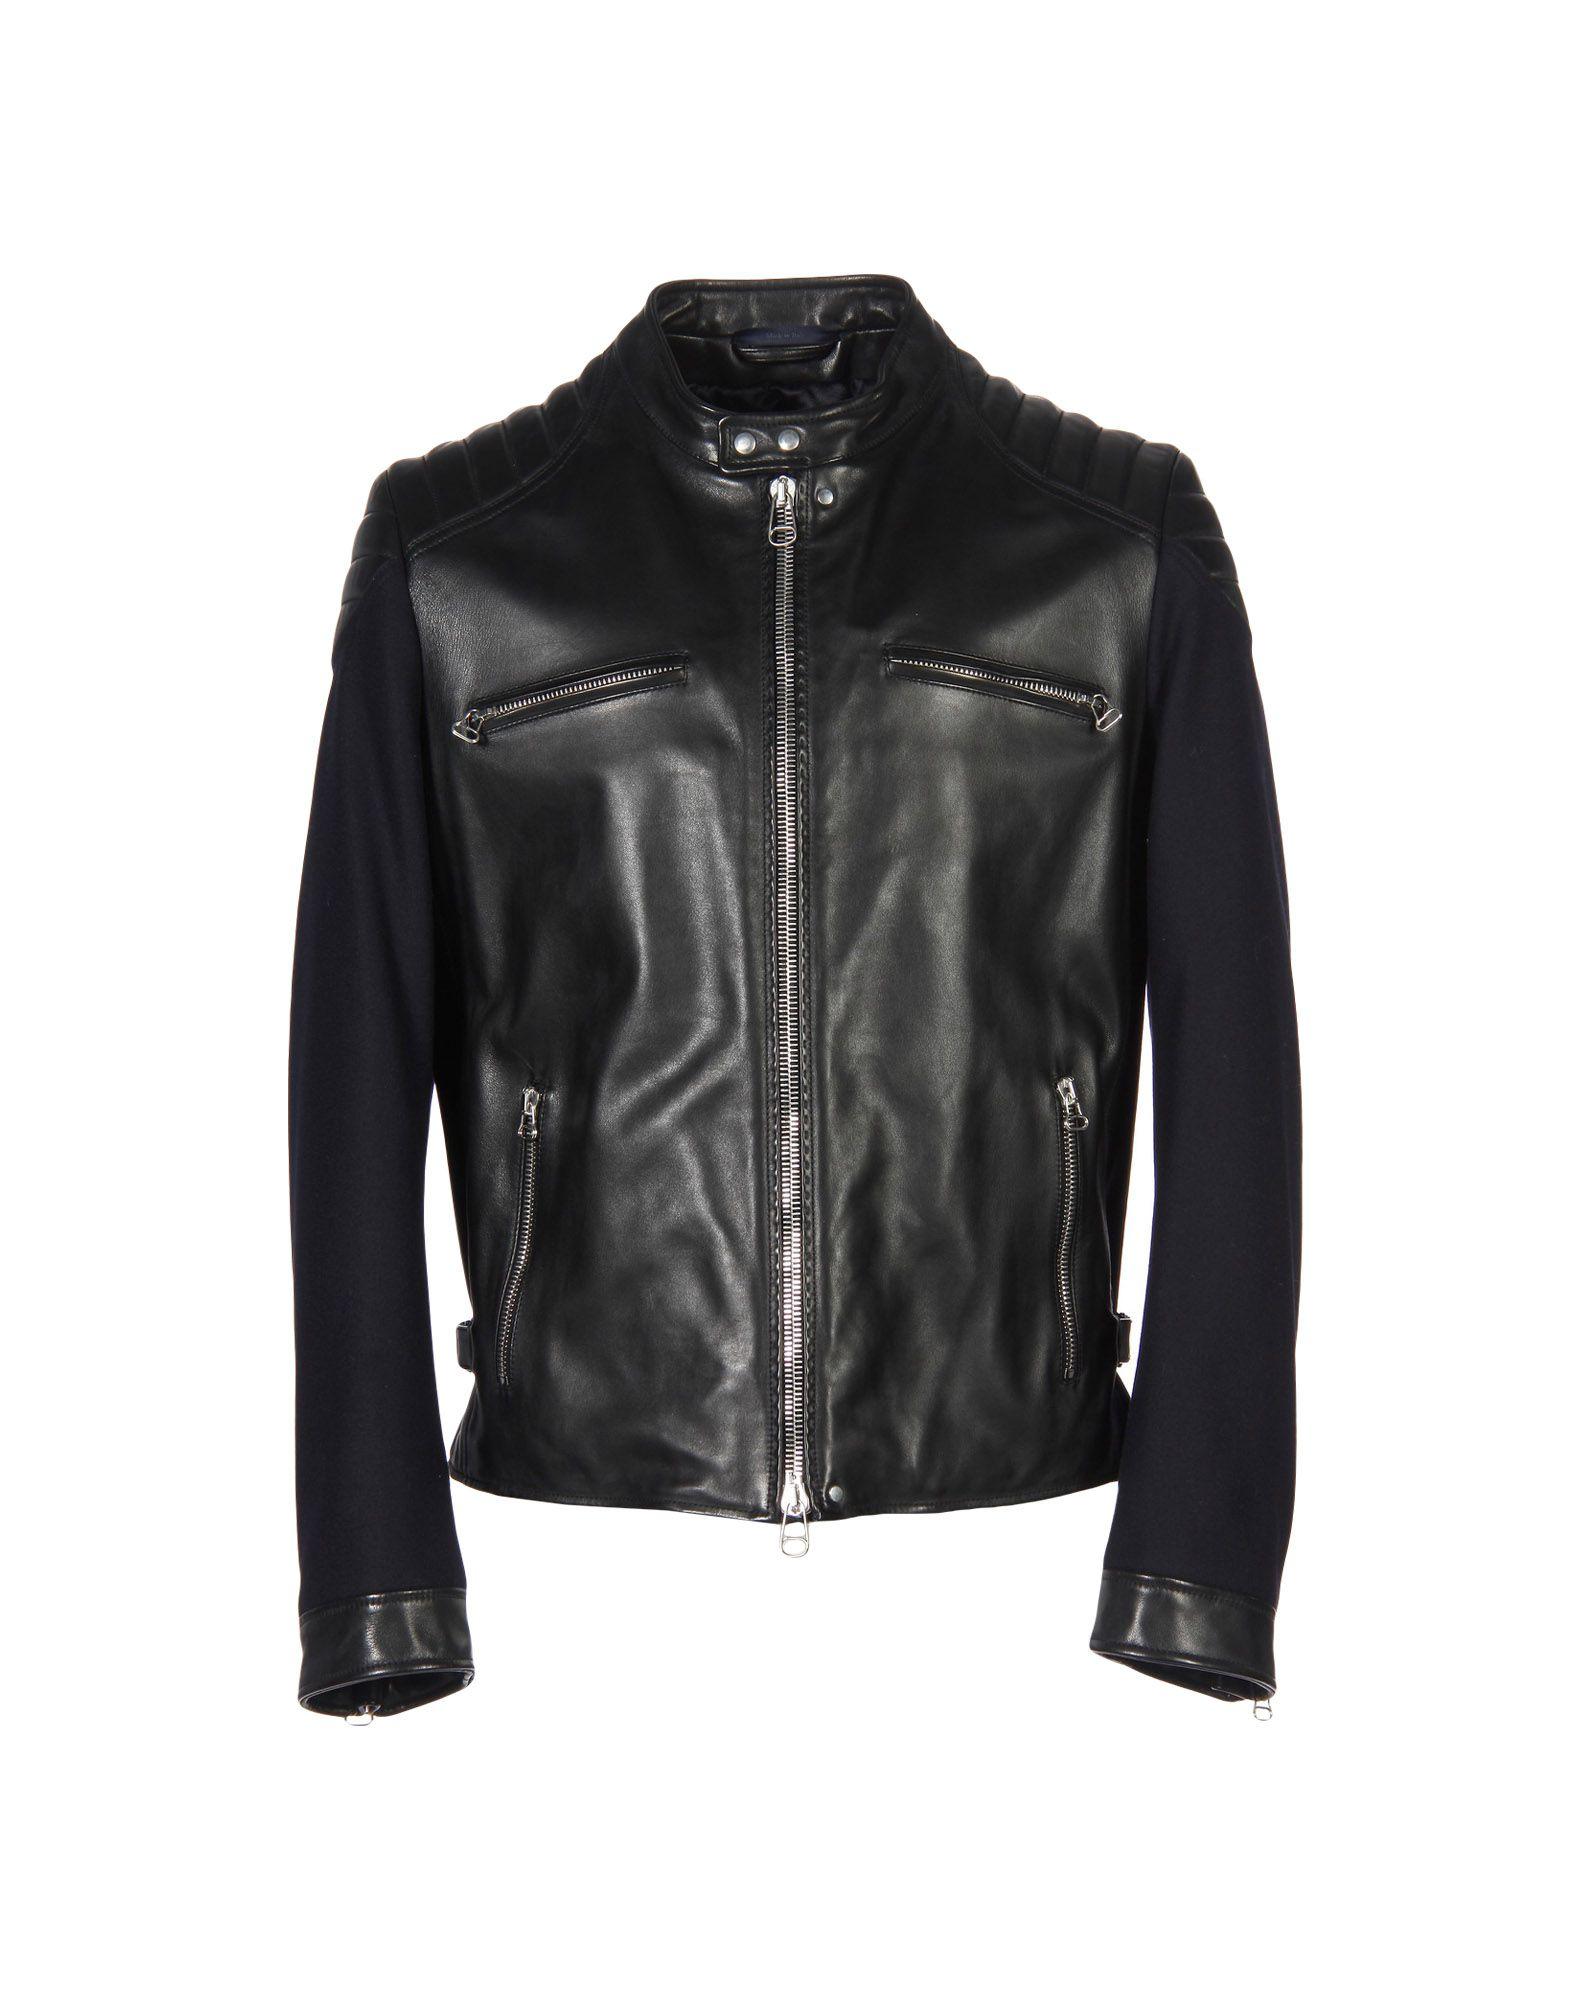 0f4c7ce197f Lanvin Leather Jacket - Men Lanvin Leather Jackets online on YOOX ...